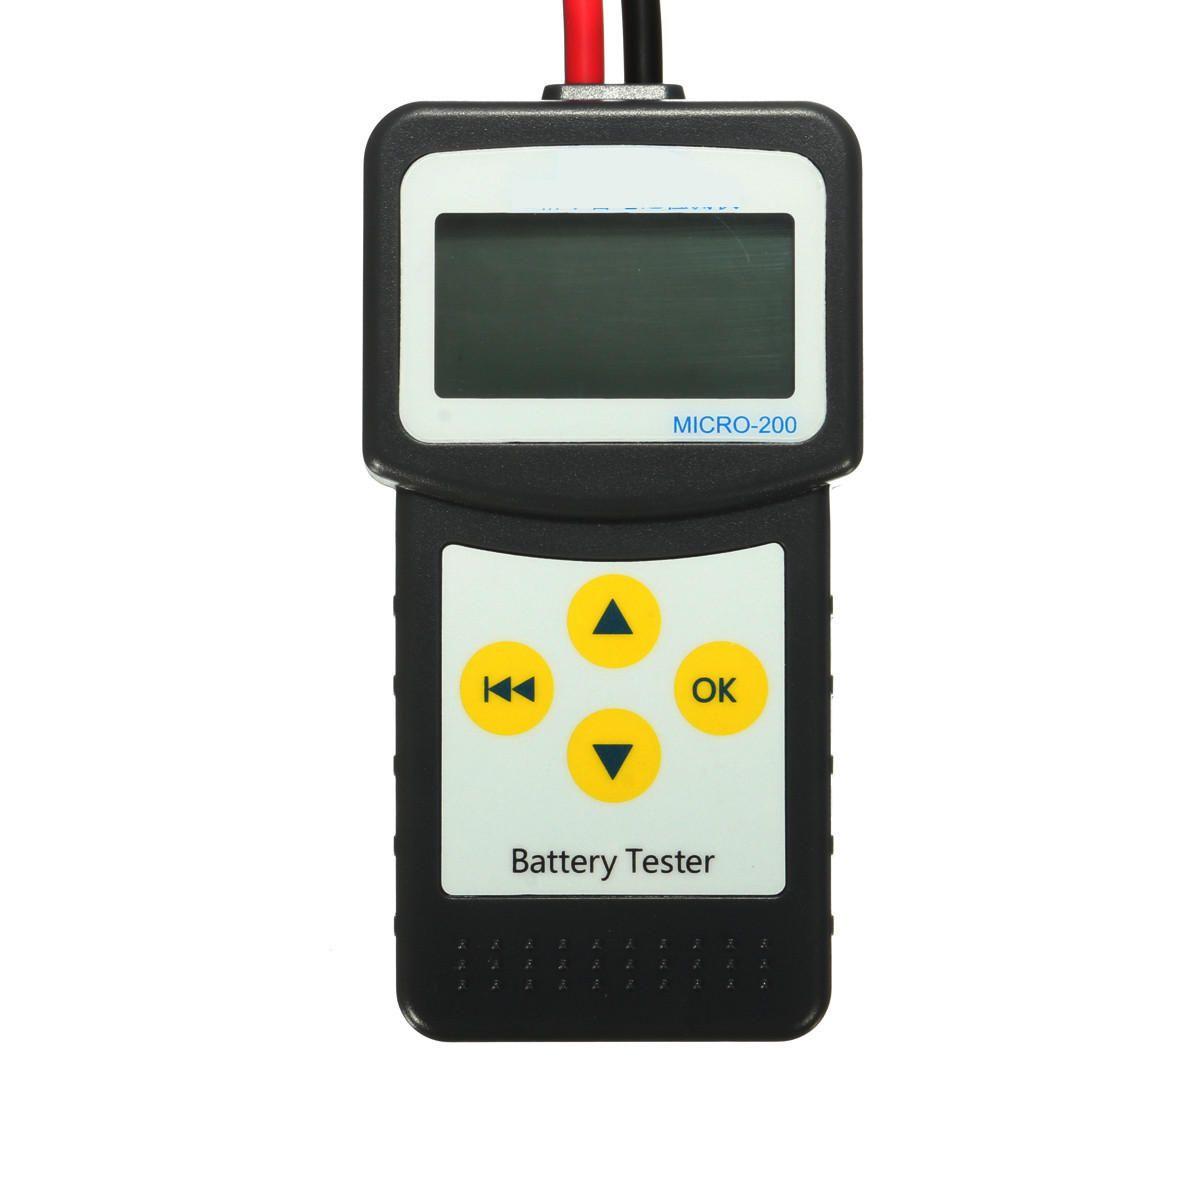 XYD US$50.99 12V Car Battery Tester Automotive Vehicle Battery Analyzer AGM GEL MICRO-200